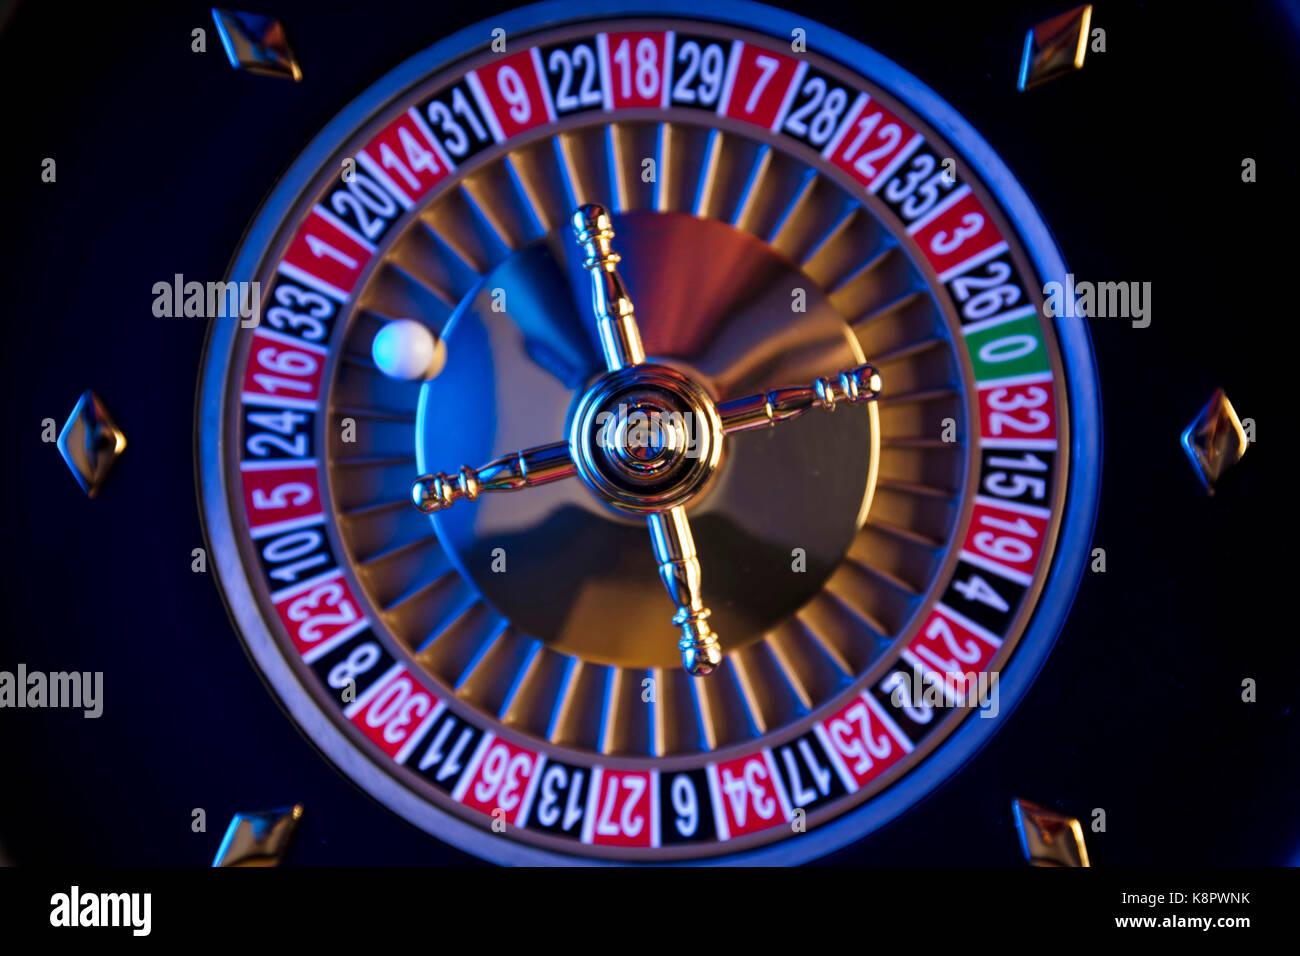 Mega joker slot machine free